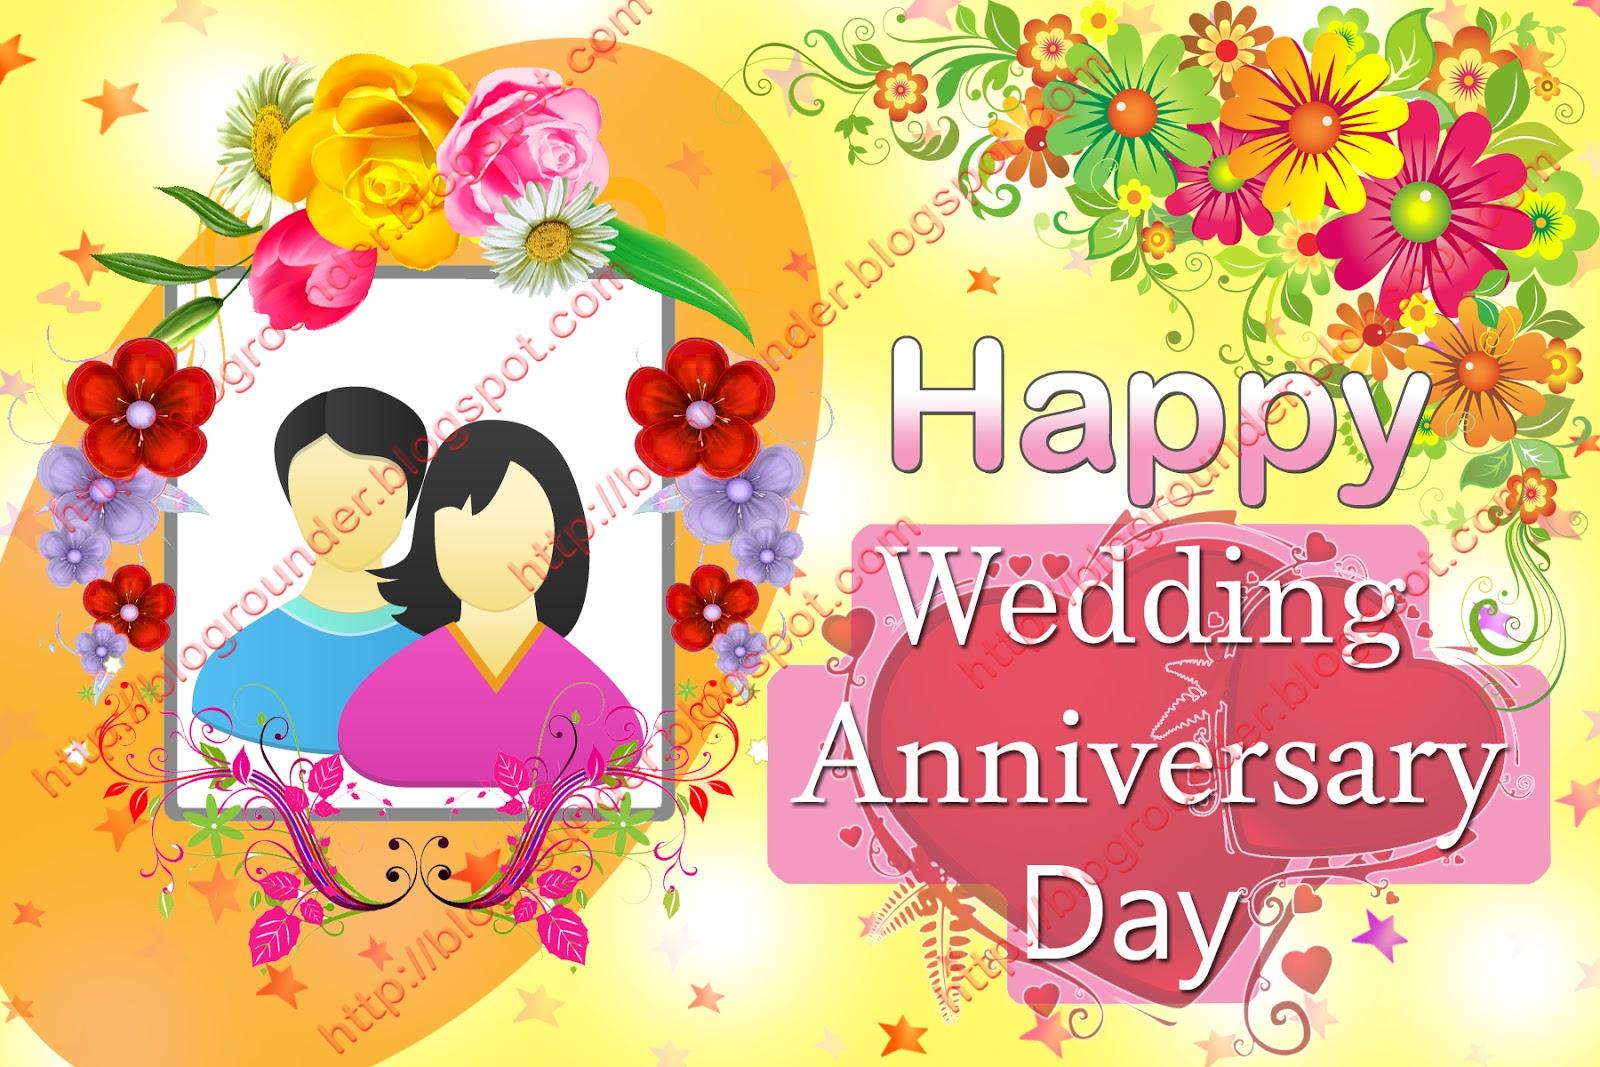 Happy wedding anniversary day greeting photoshop psd file free